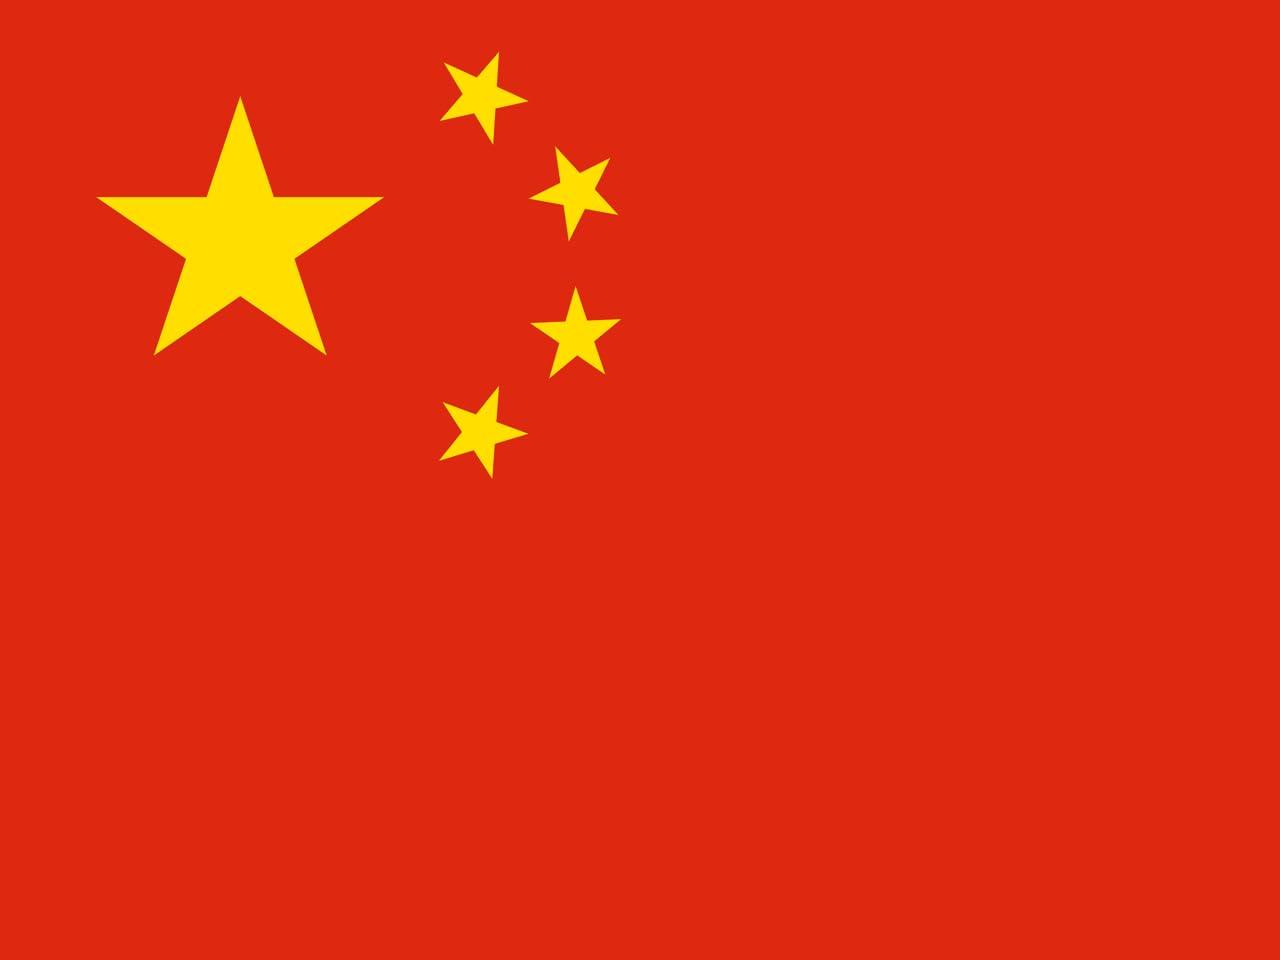 Verkaufen bei Amazon China